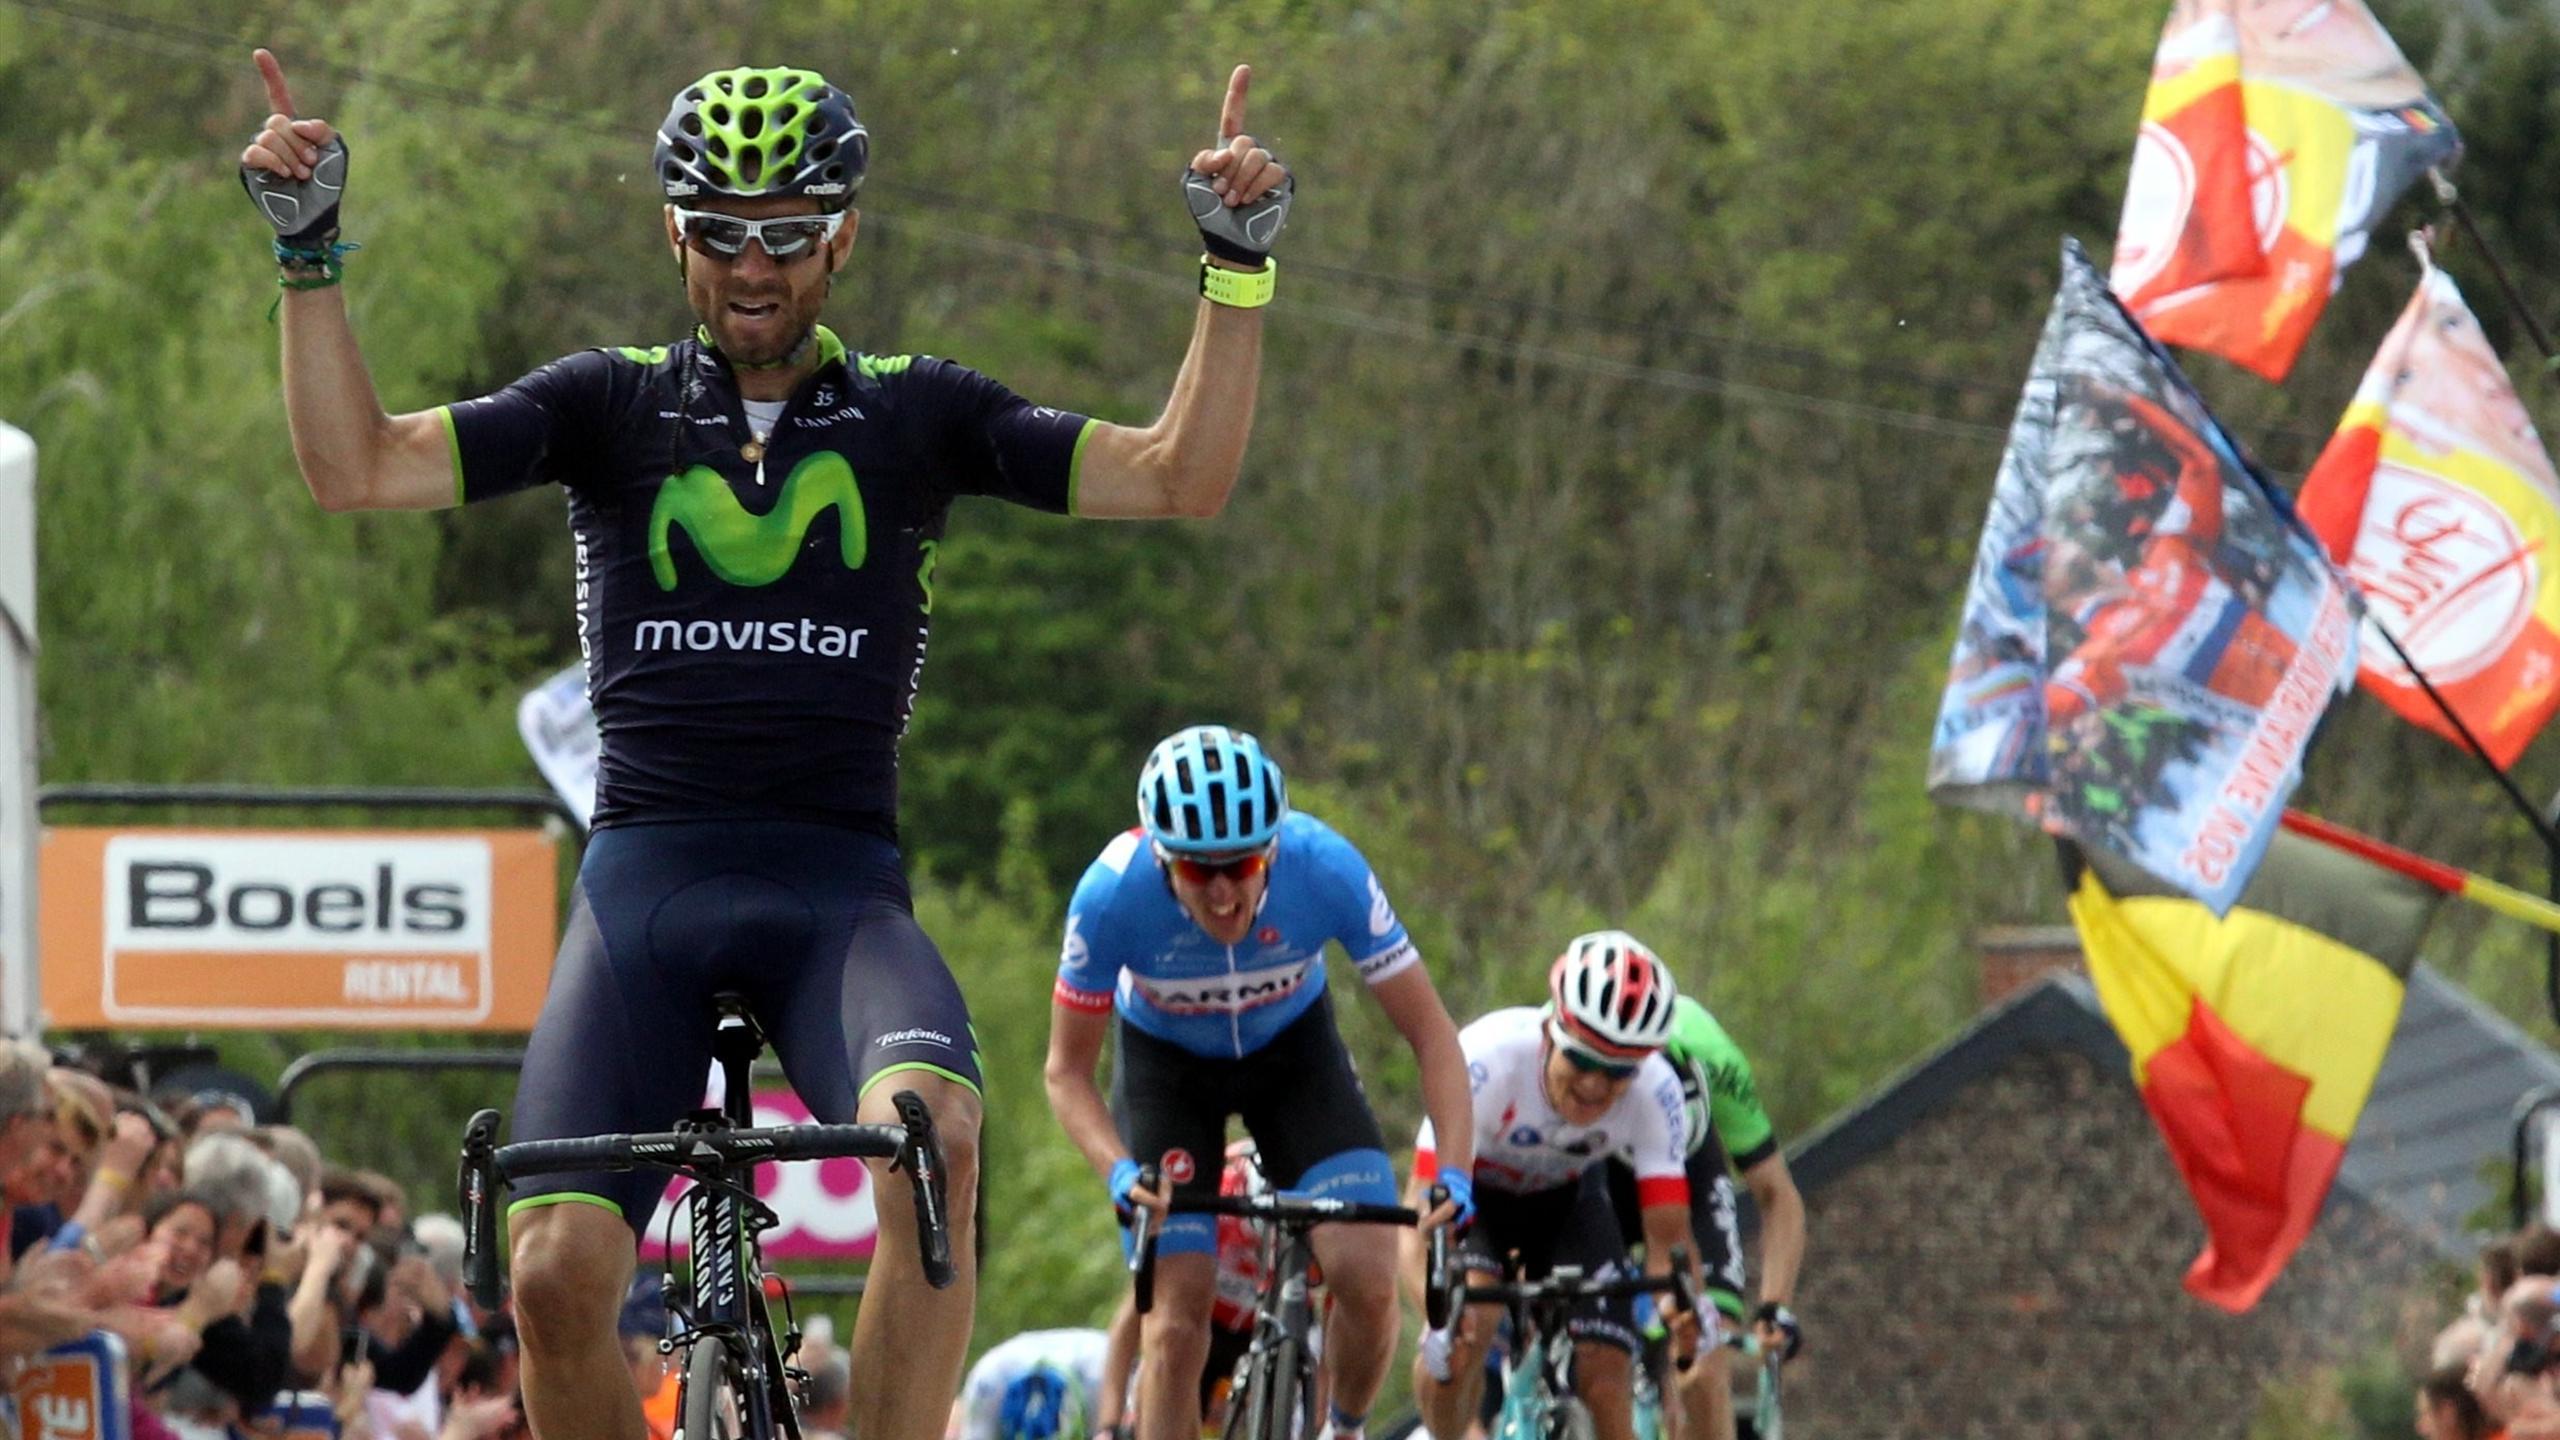 Alejandro Valverde (Movistar) remporte la Flèche wallonne 2014